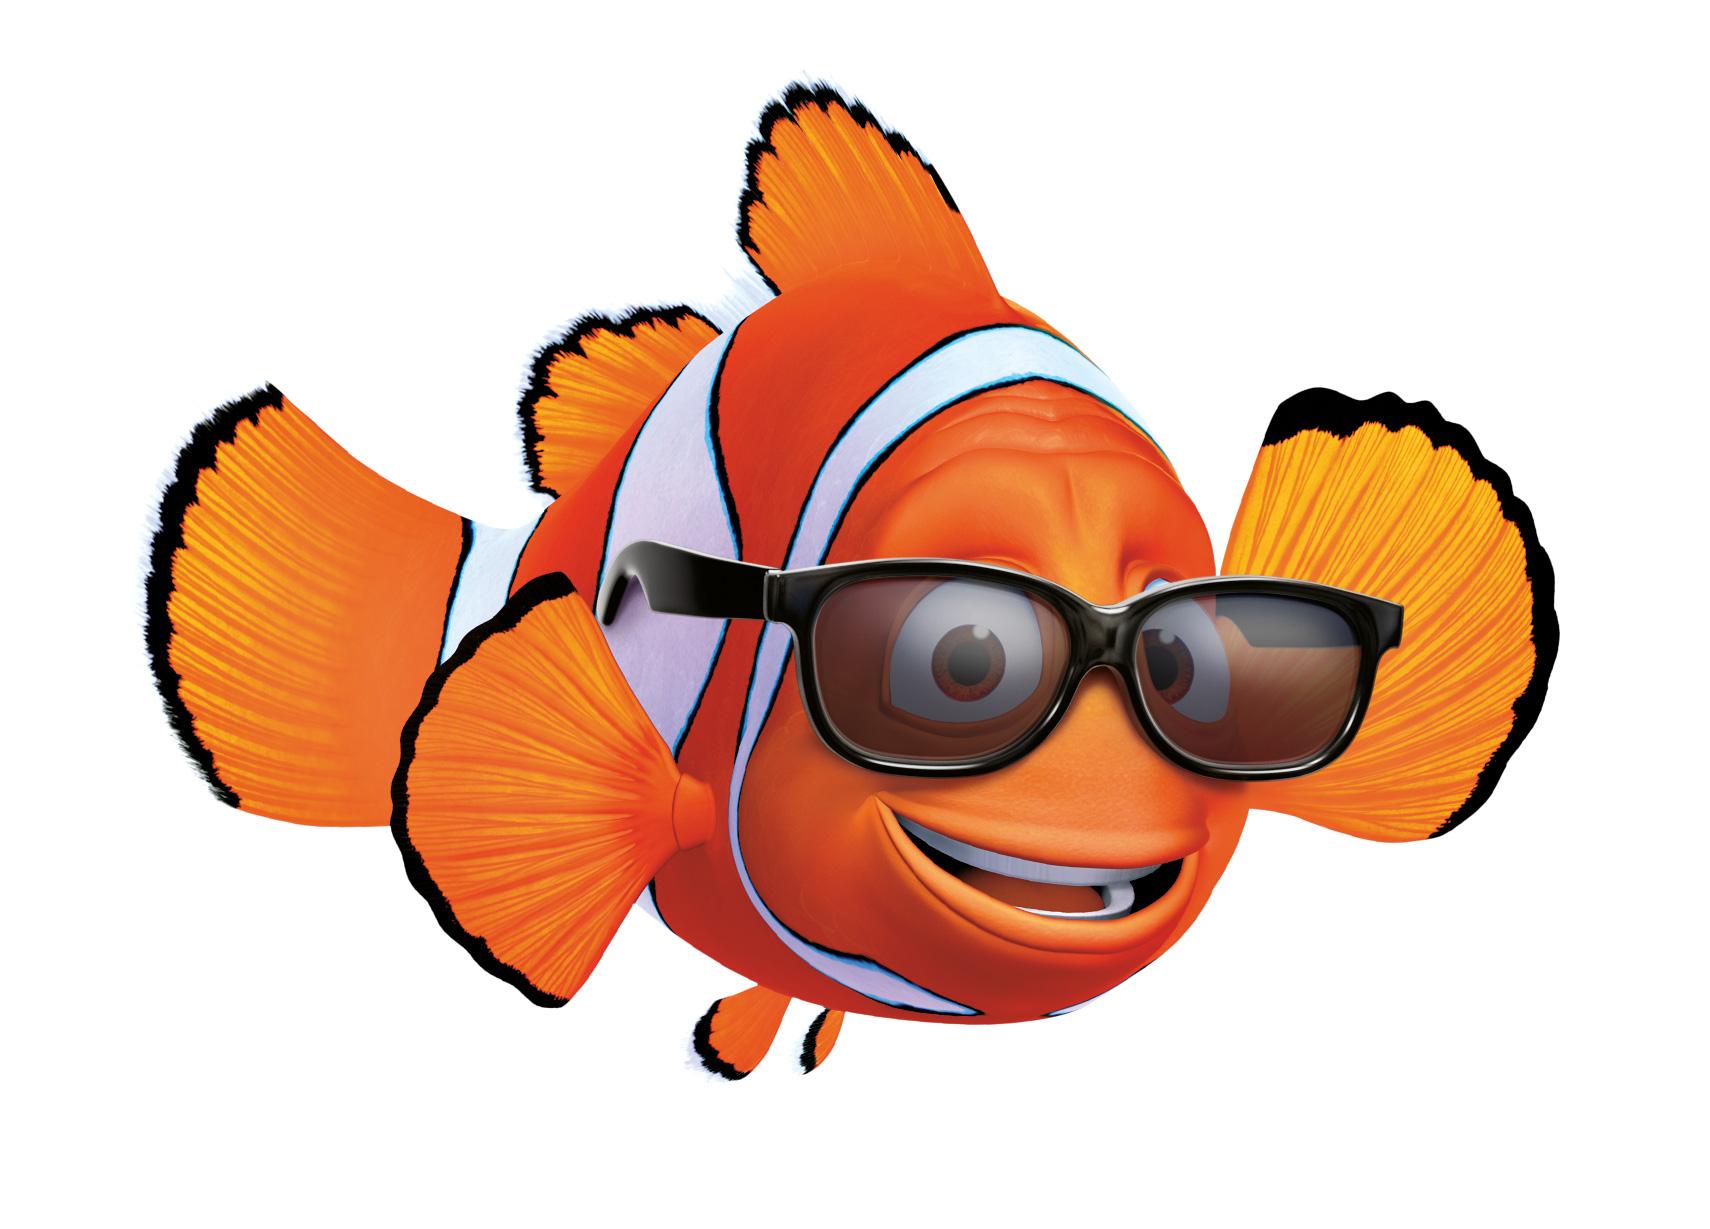 Nemo Cliparts | Free download best Nemo Cliparts on ClipArtMag.com